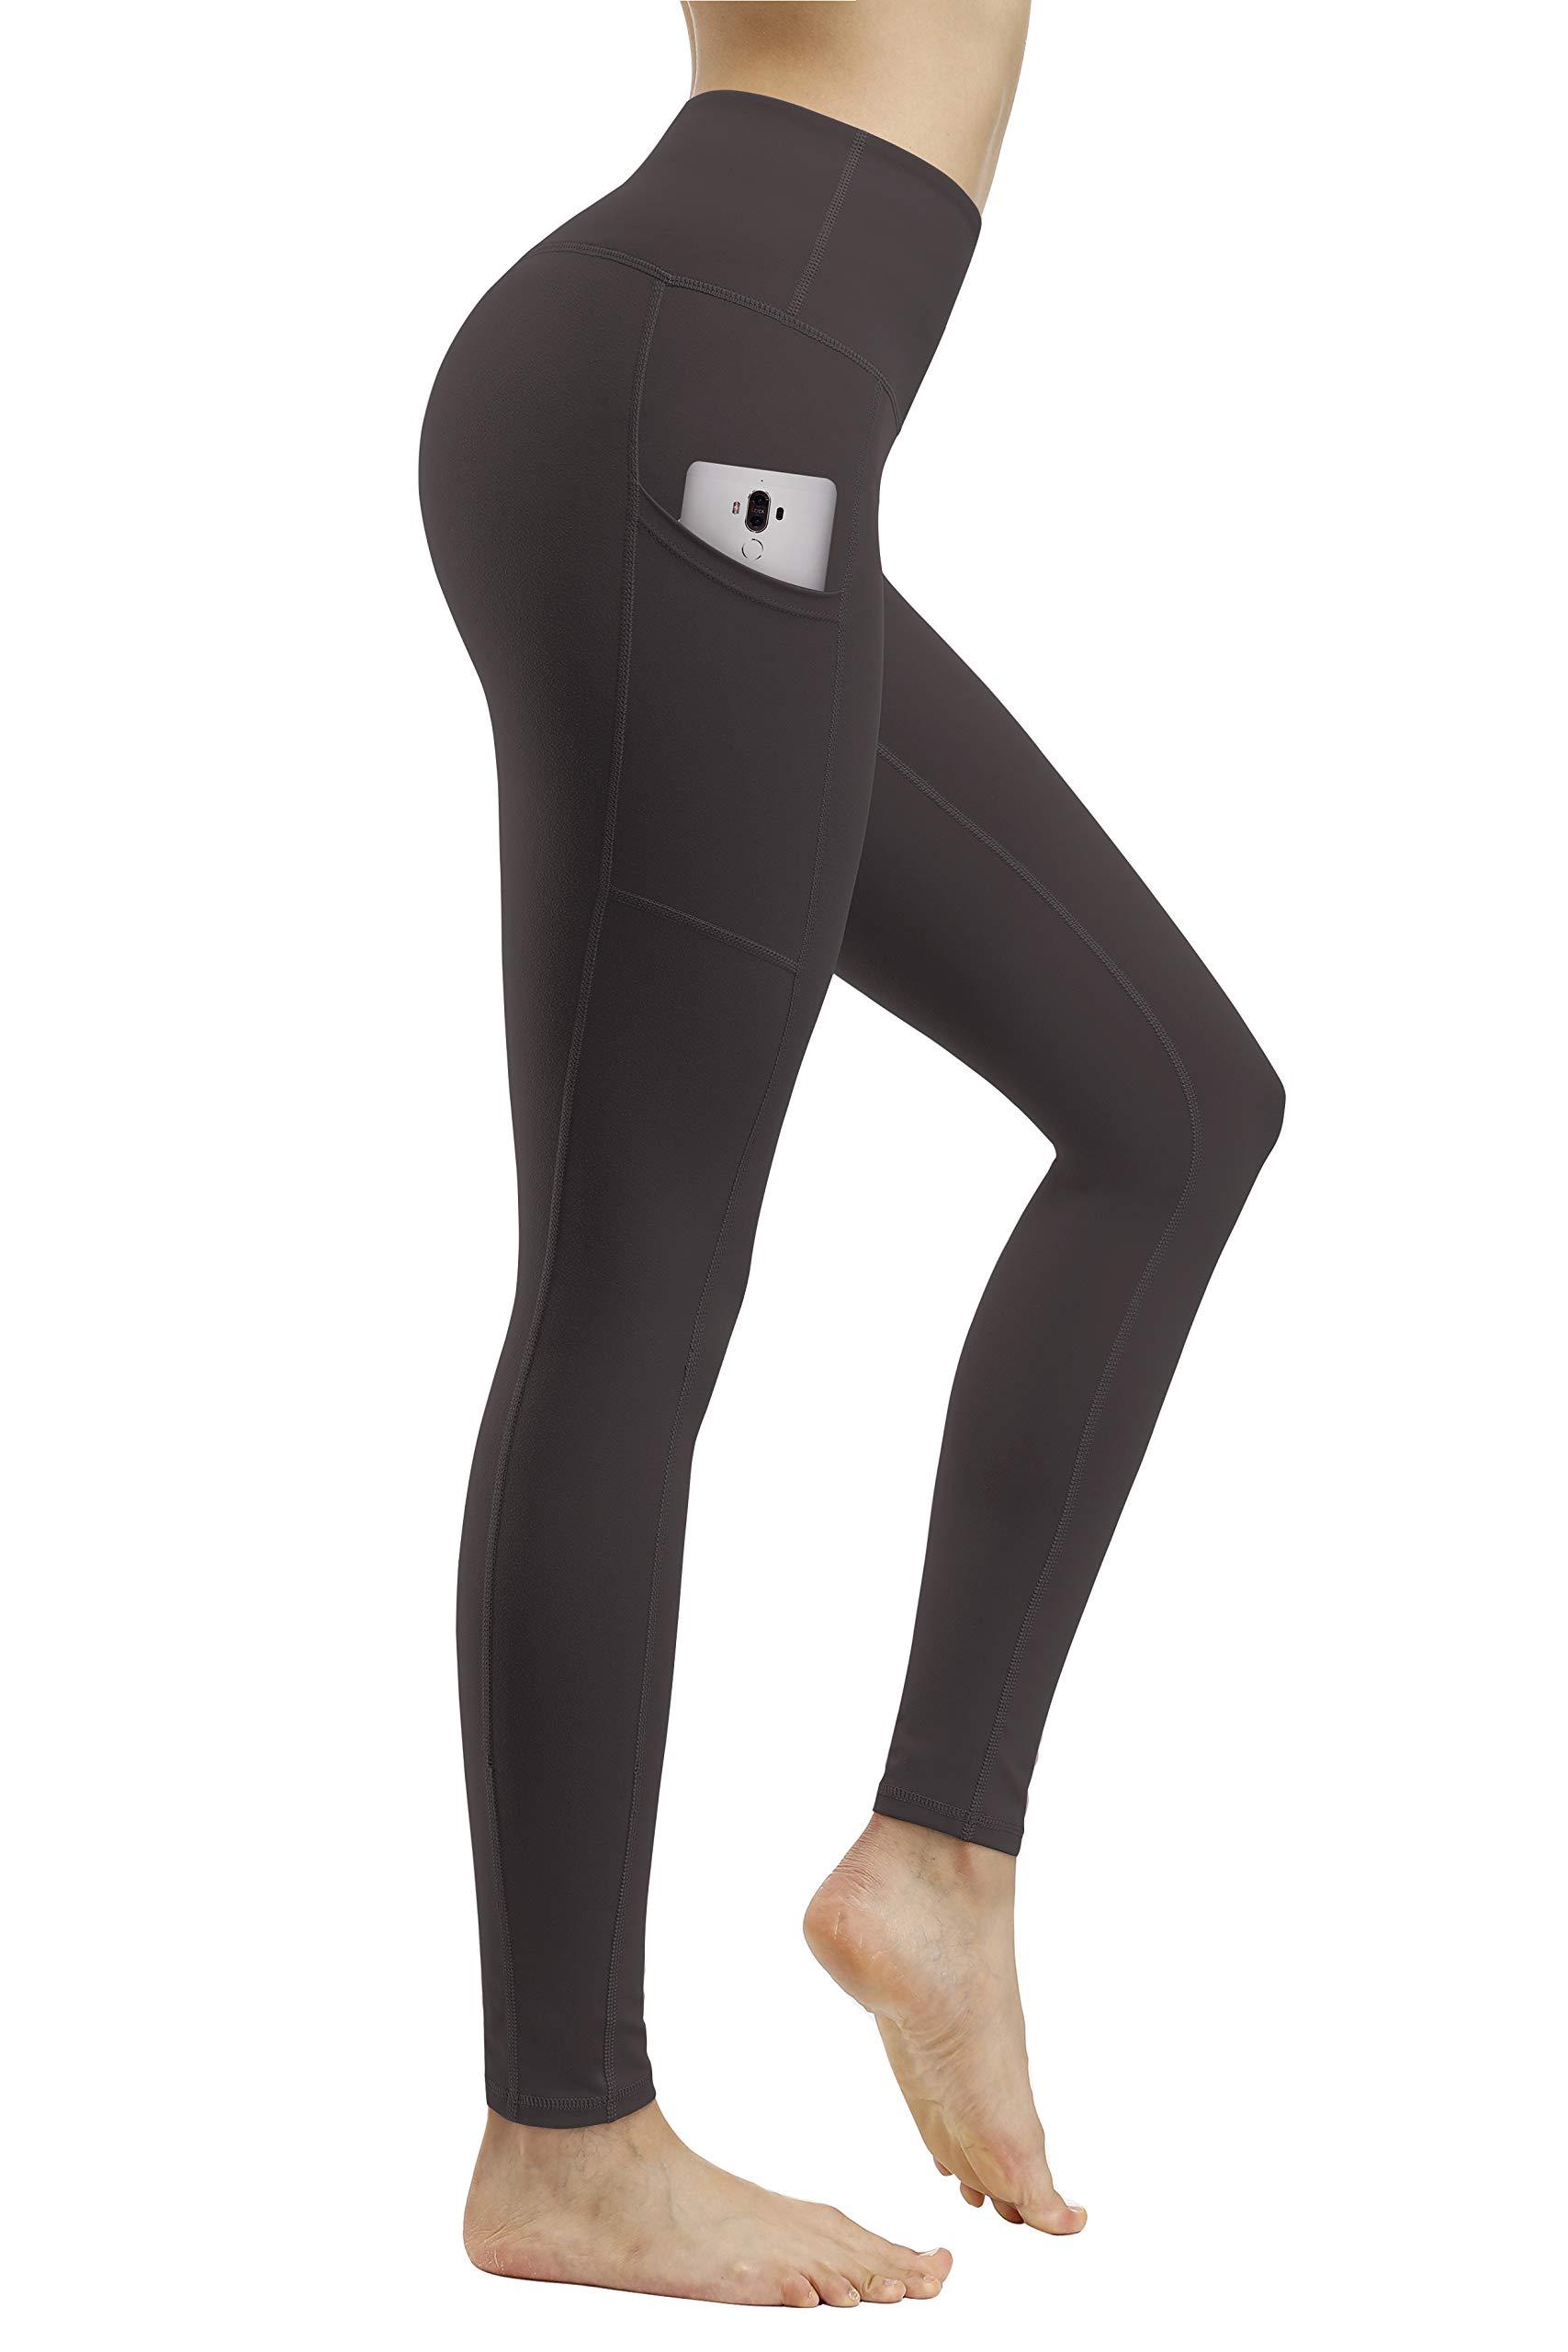 Fengbay High Waist Yoga Pants, Pocket Yoga Pants Tummy Control Workout Running 4 Way Stretch Yoga Leggings Leggings Dark Grey by Fengbay